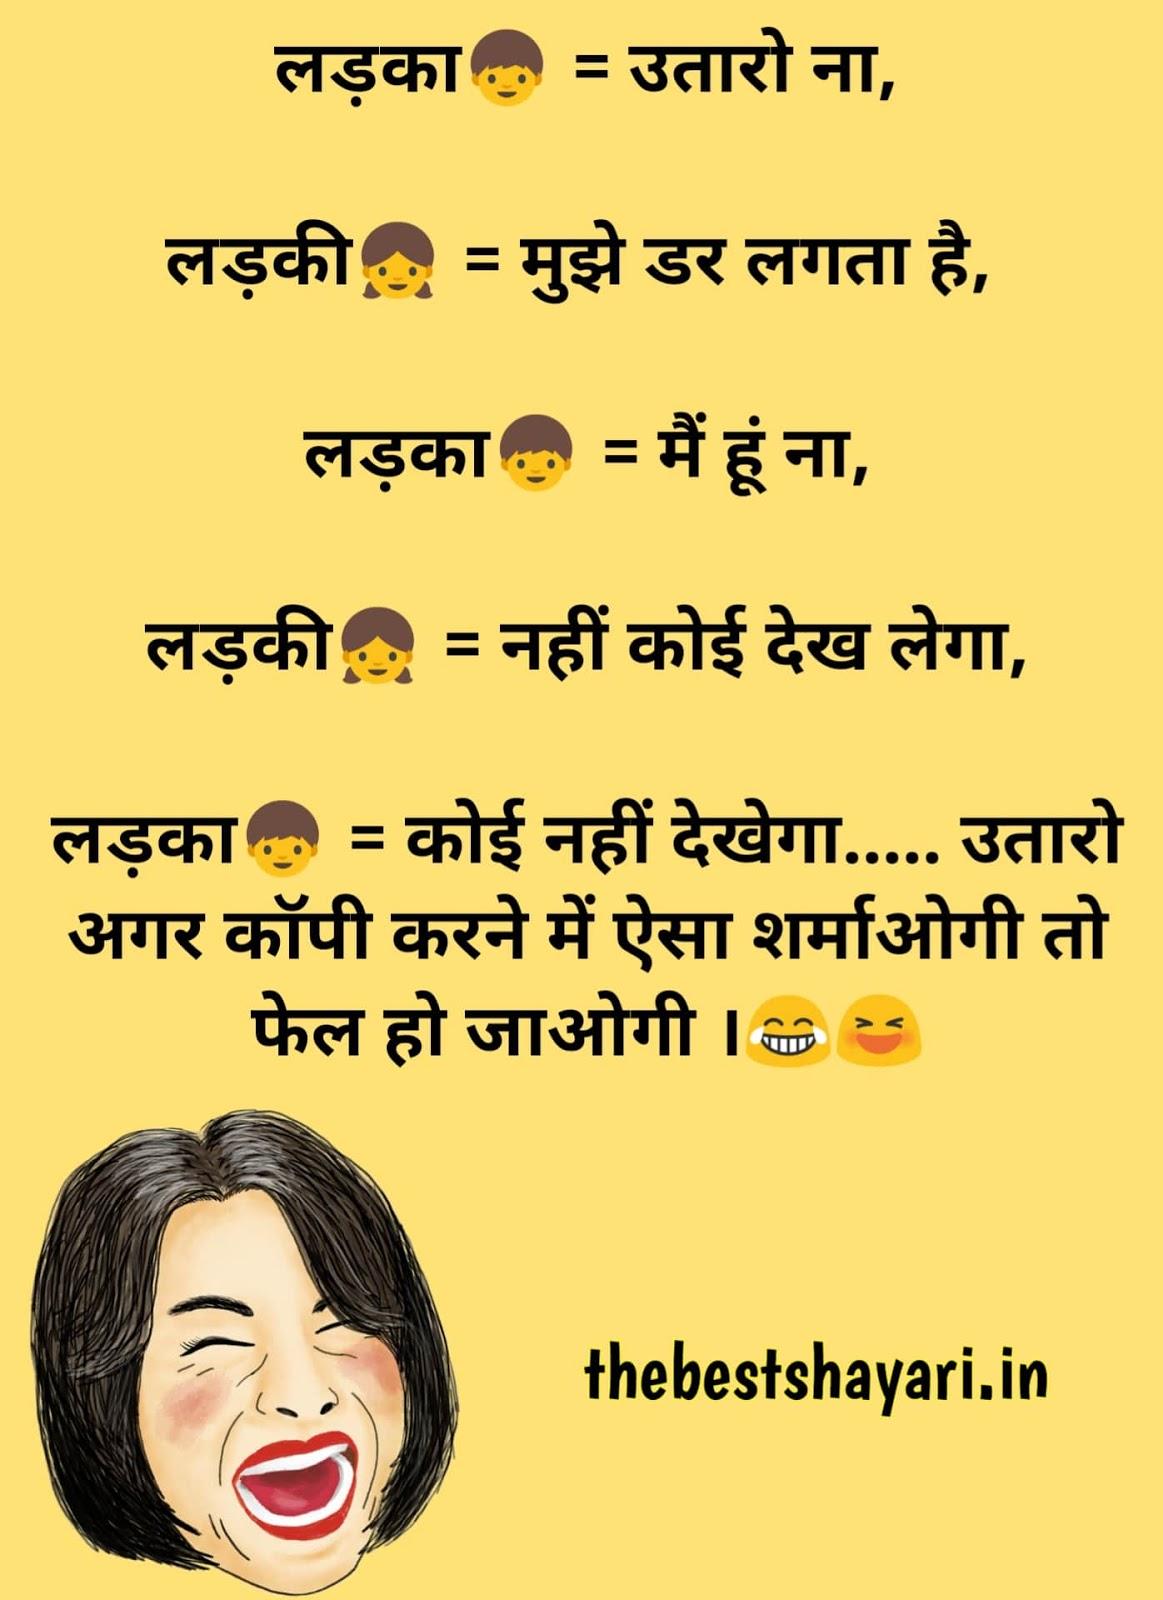 Funny Chutkule in Hindi & English for Whatsapp